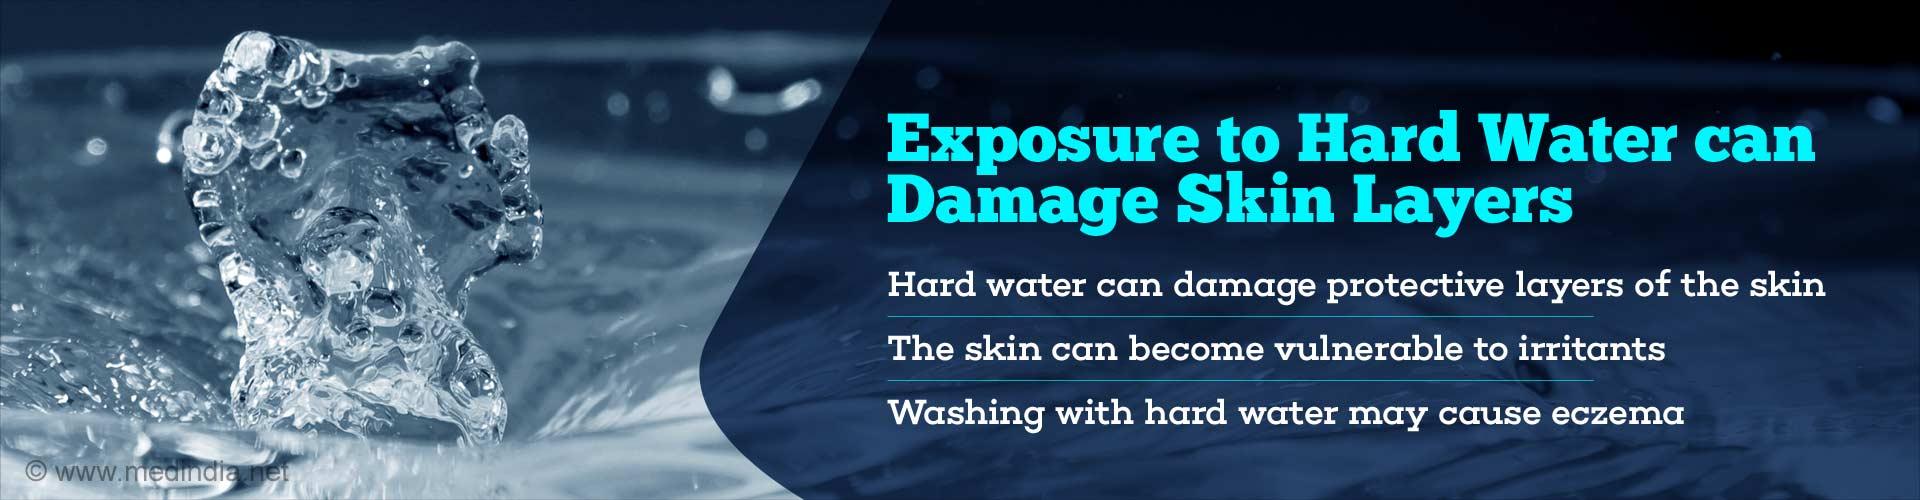 Hard Water Can Damage Skin, Cause Eczema